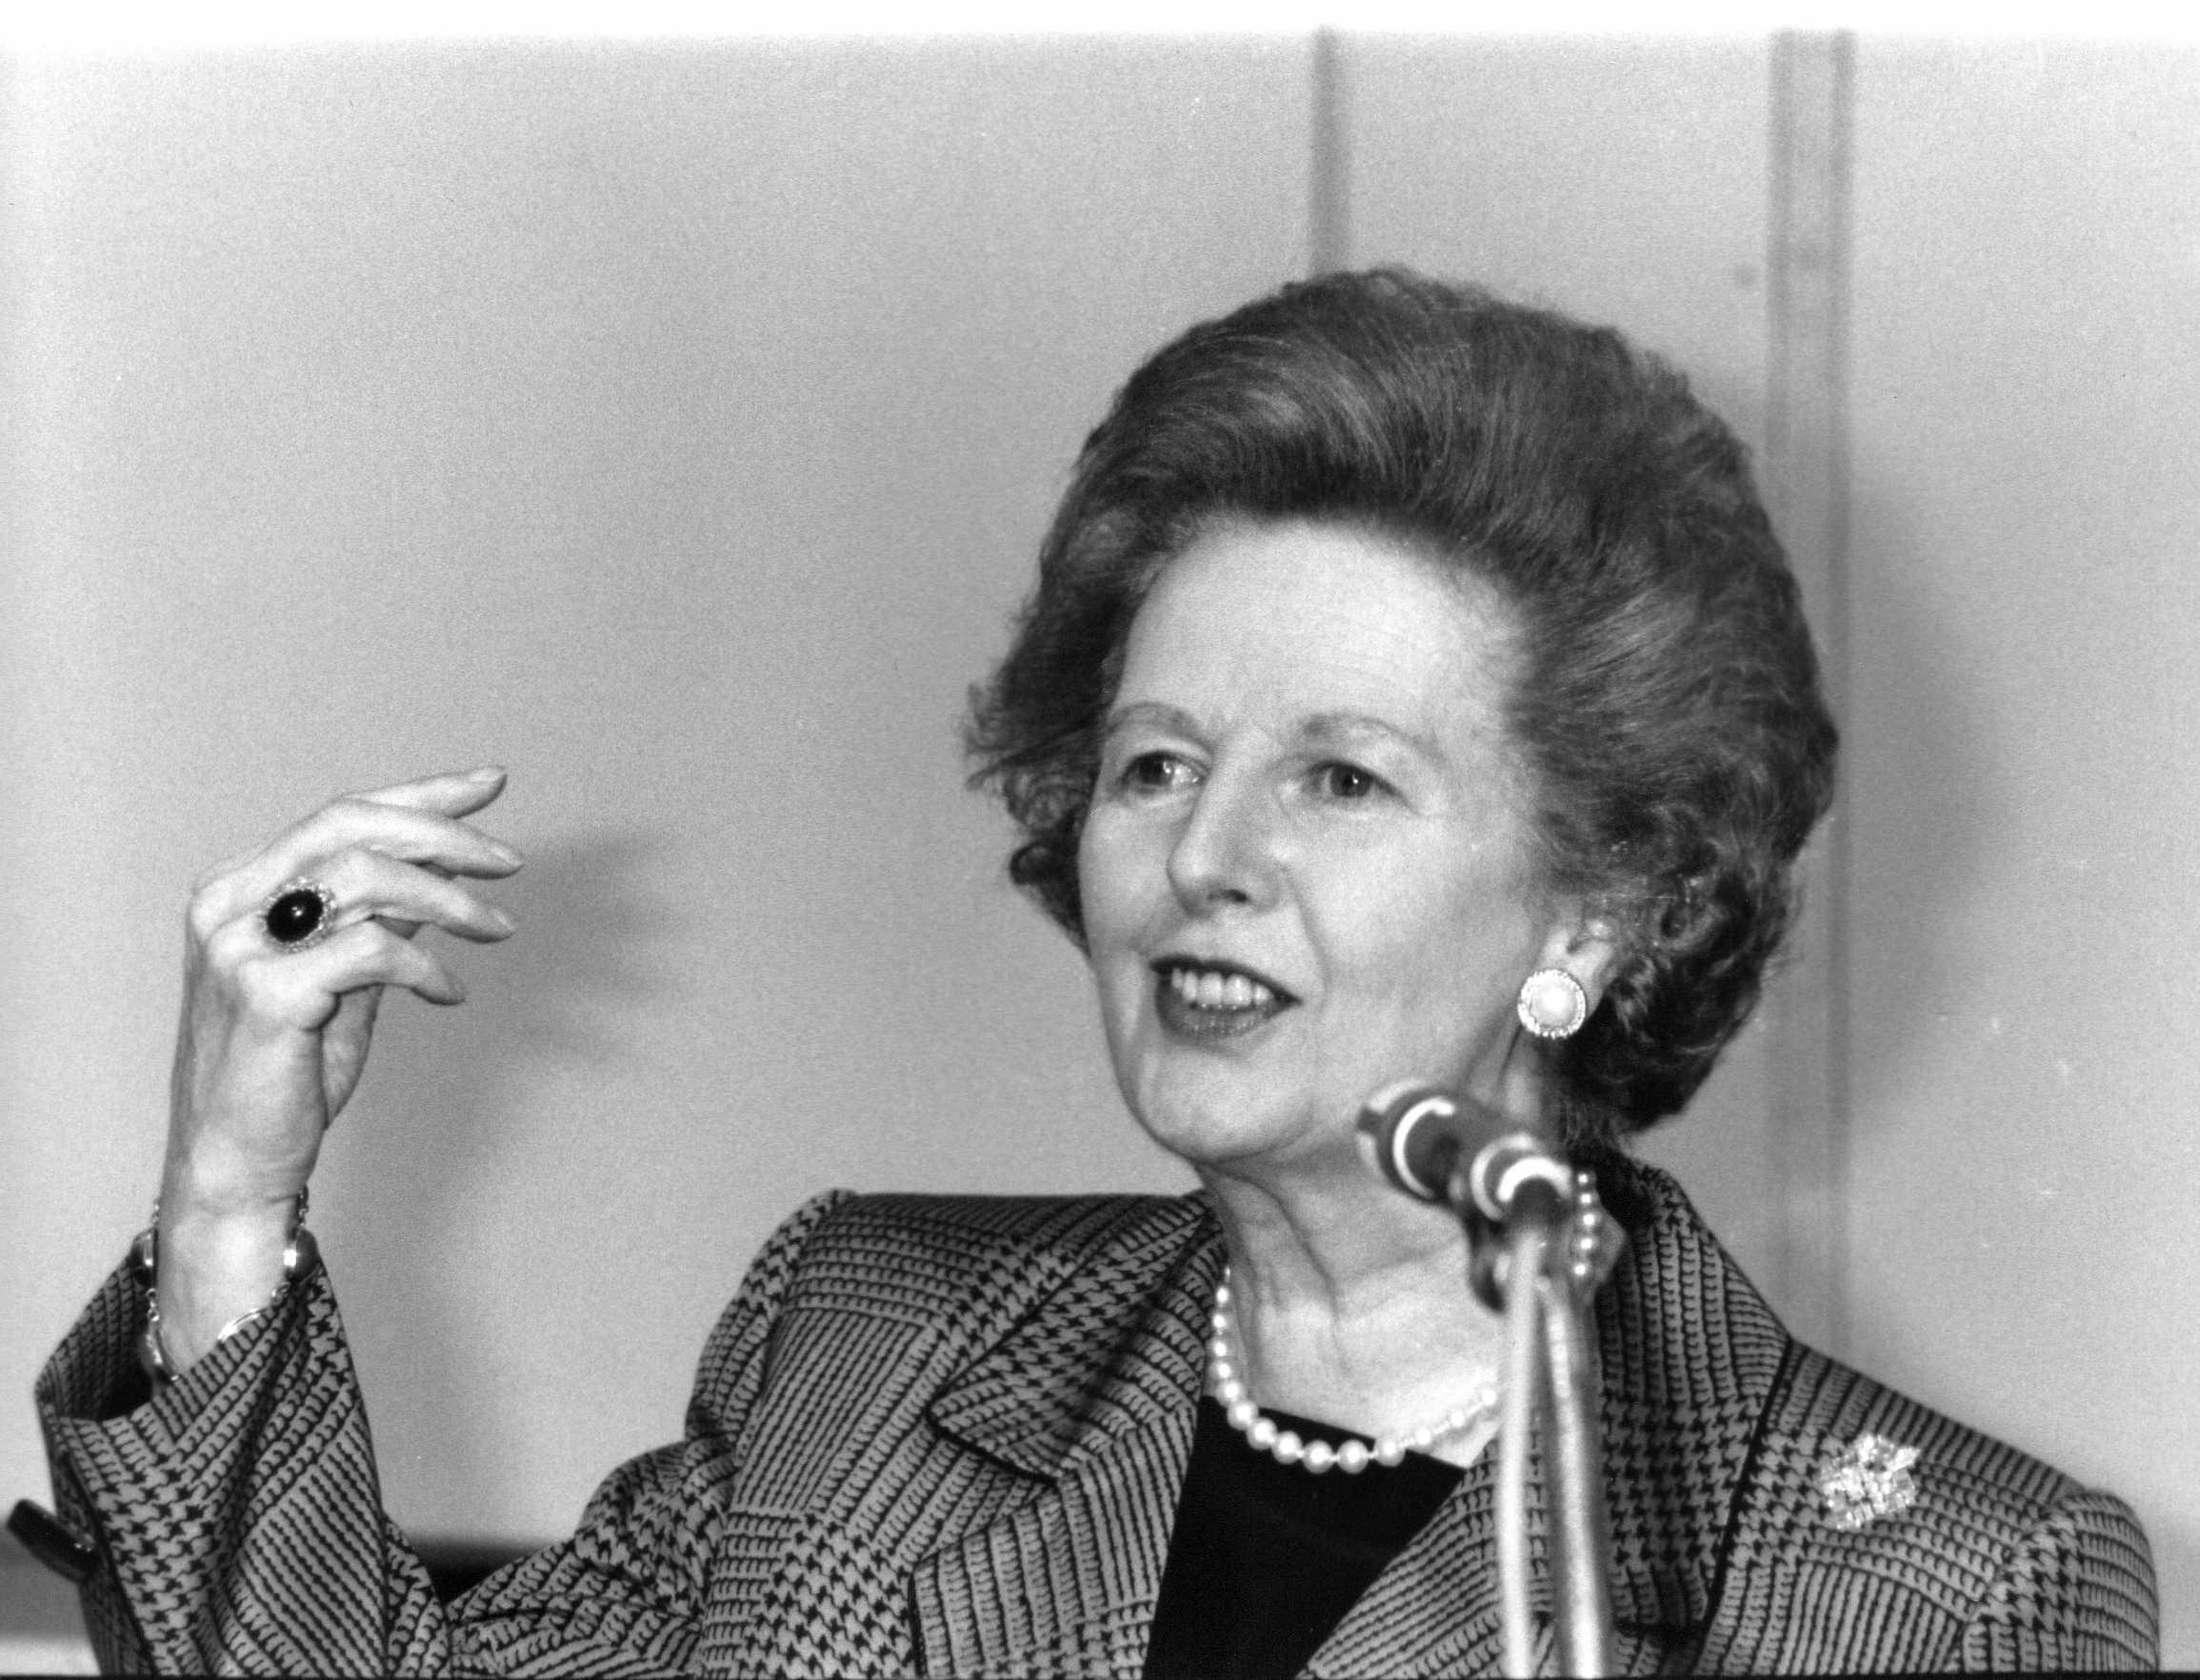 margaret thatcher success quotes, insulting politicians